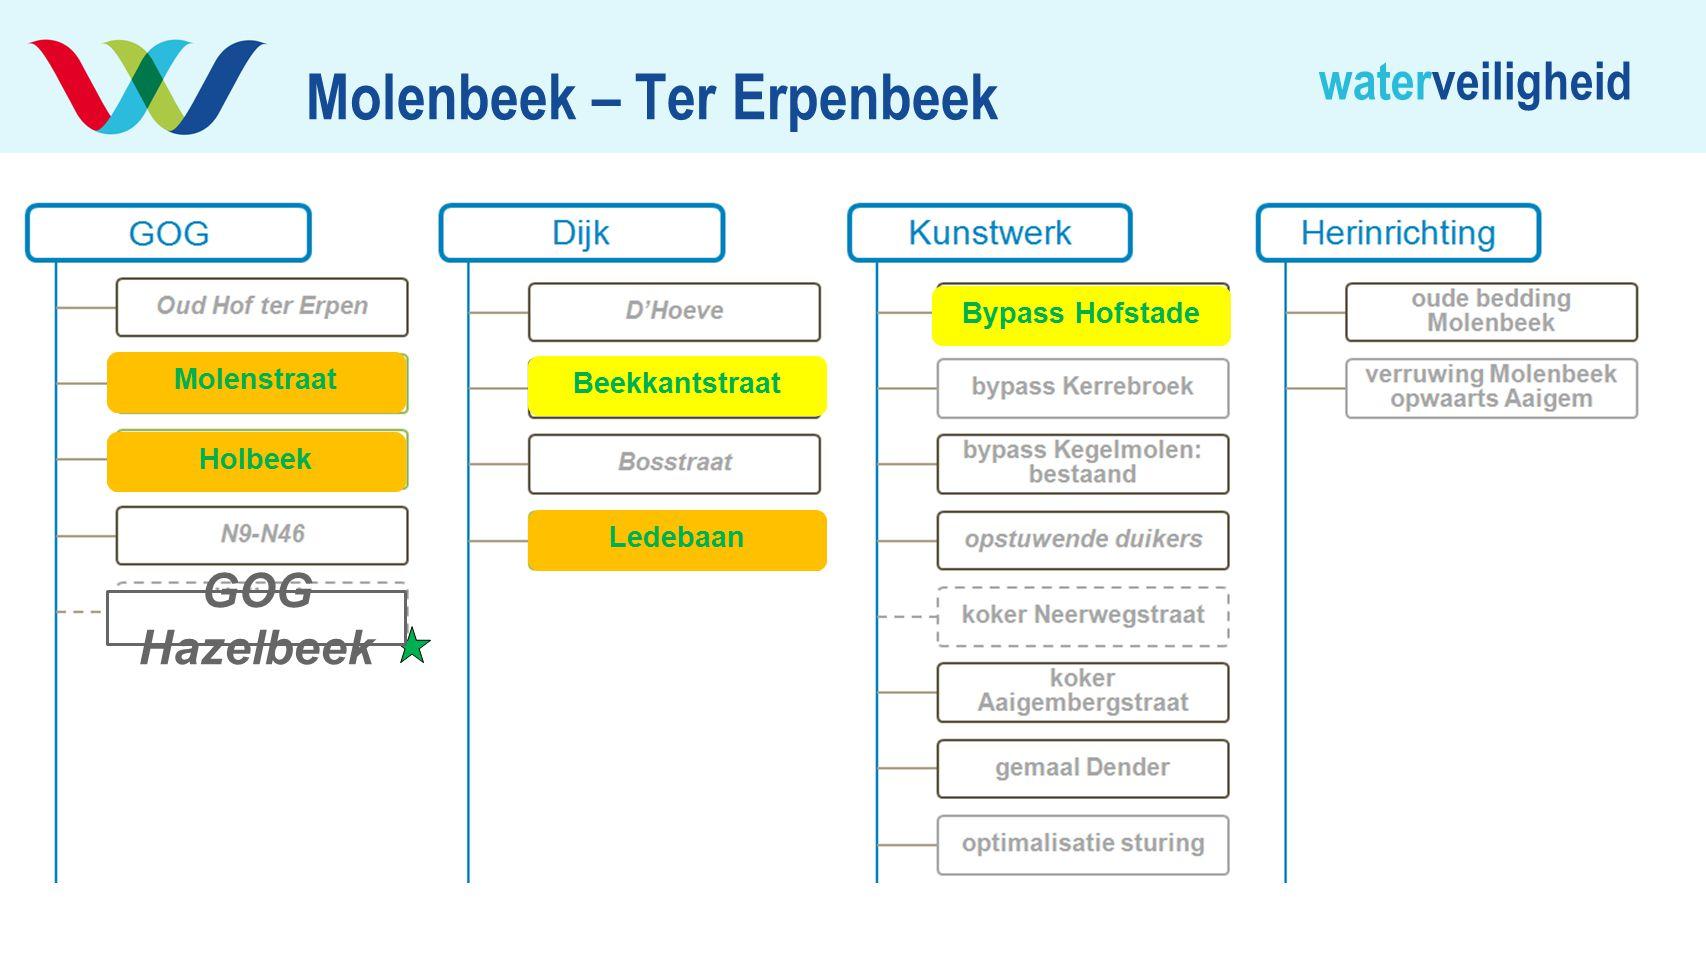 Molenbeek – Ter Erpenbeek